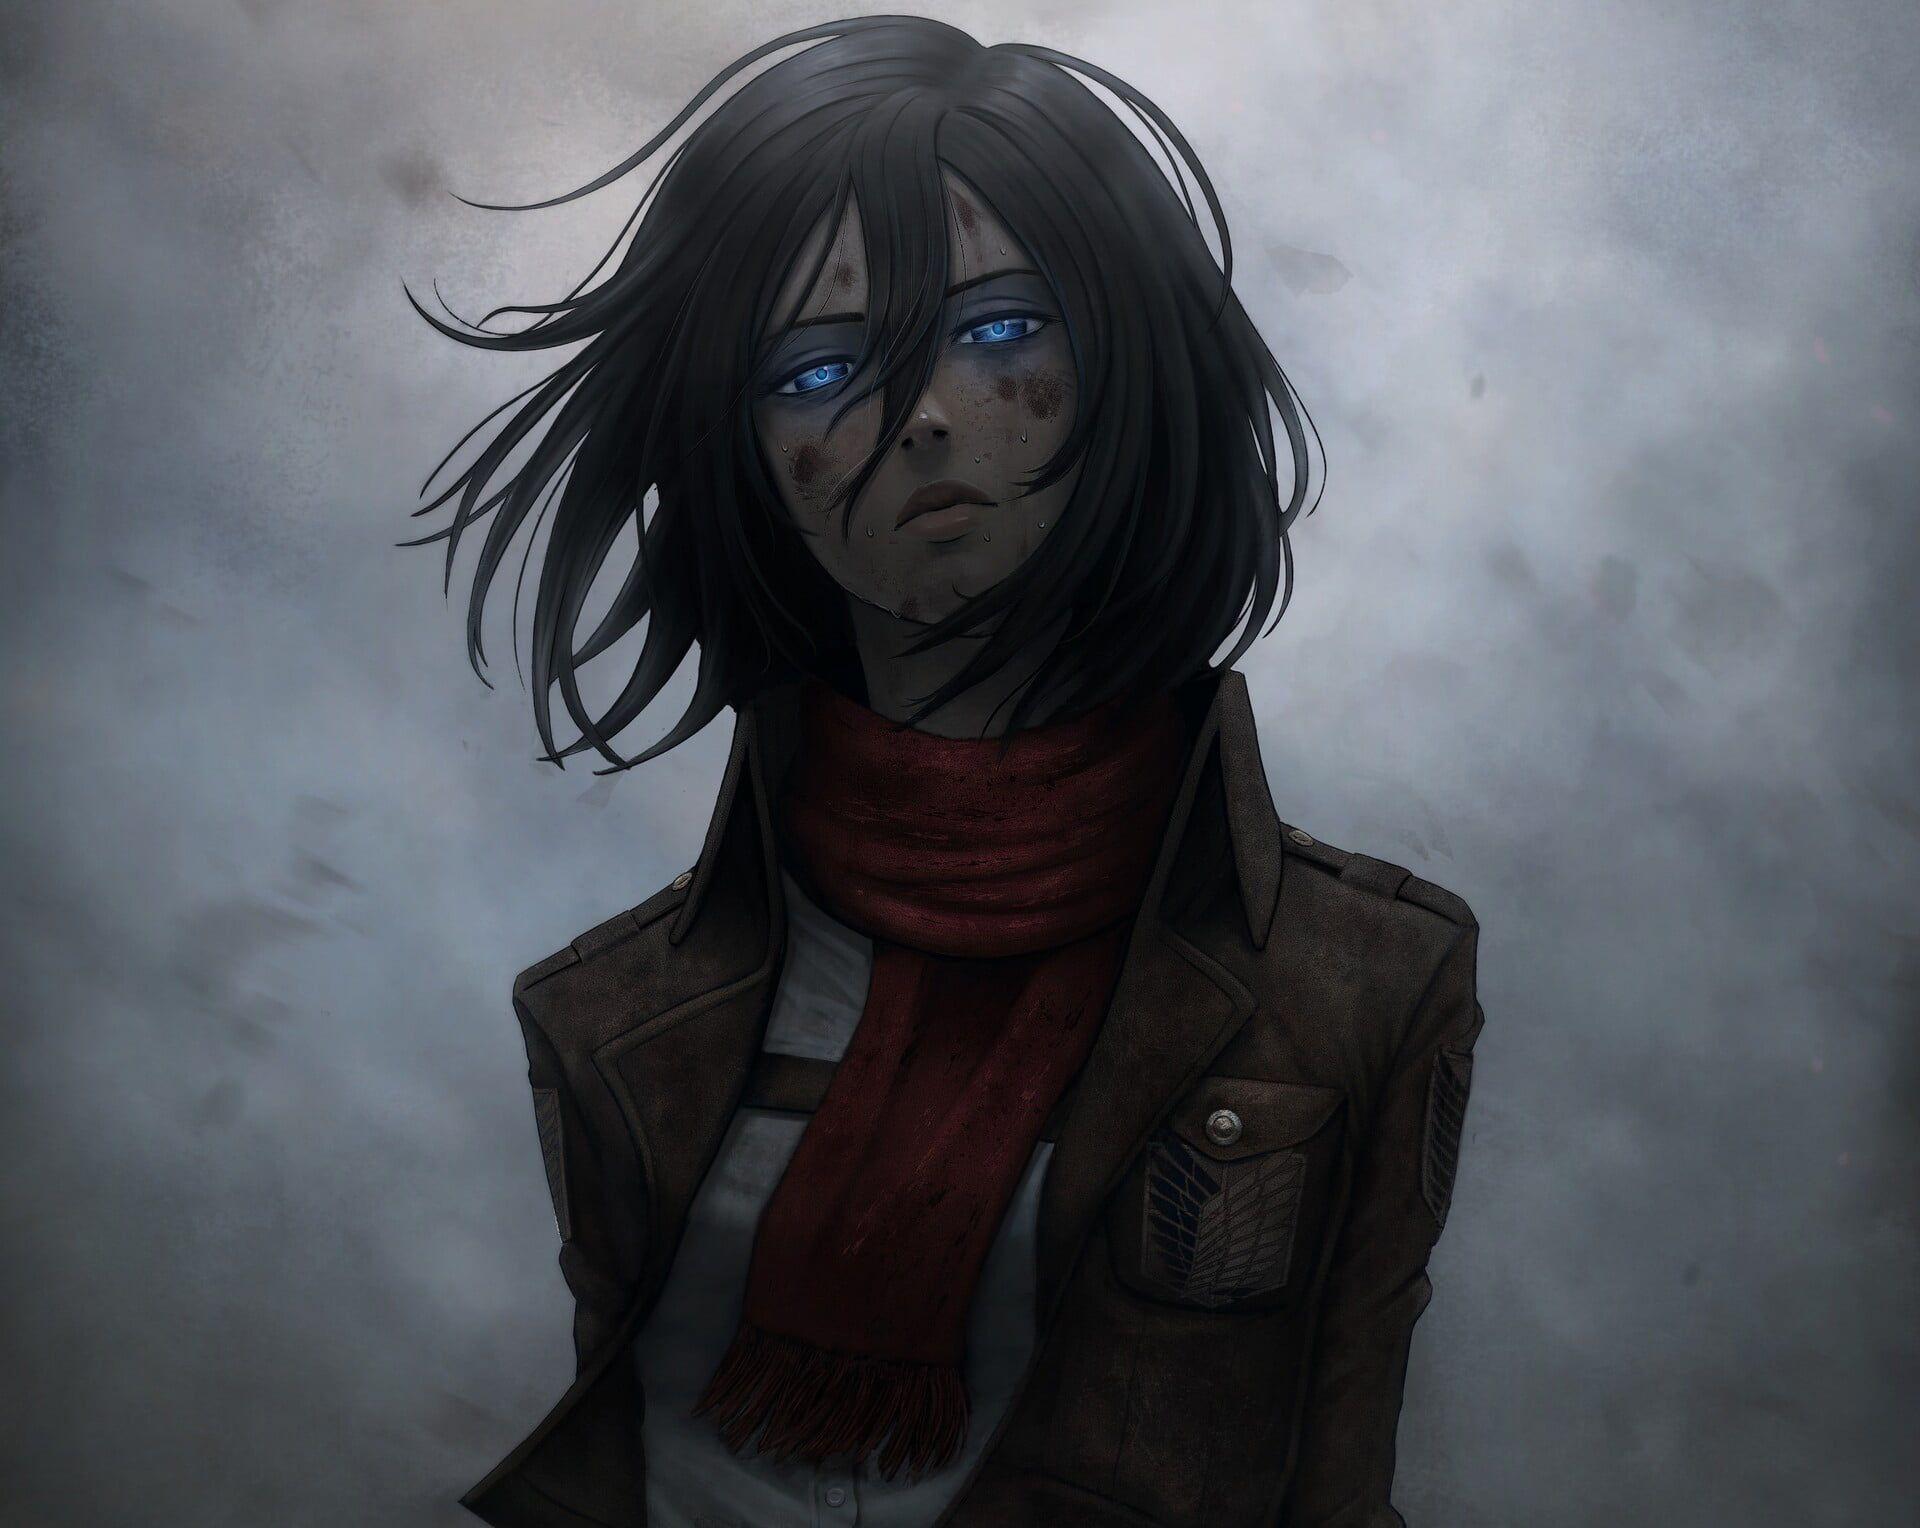 Anime Attack On Titan Attack on Titan Black Hair Blue